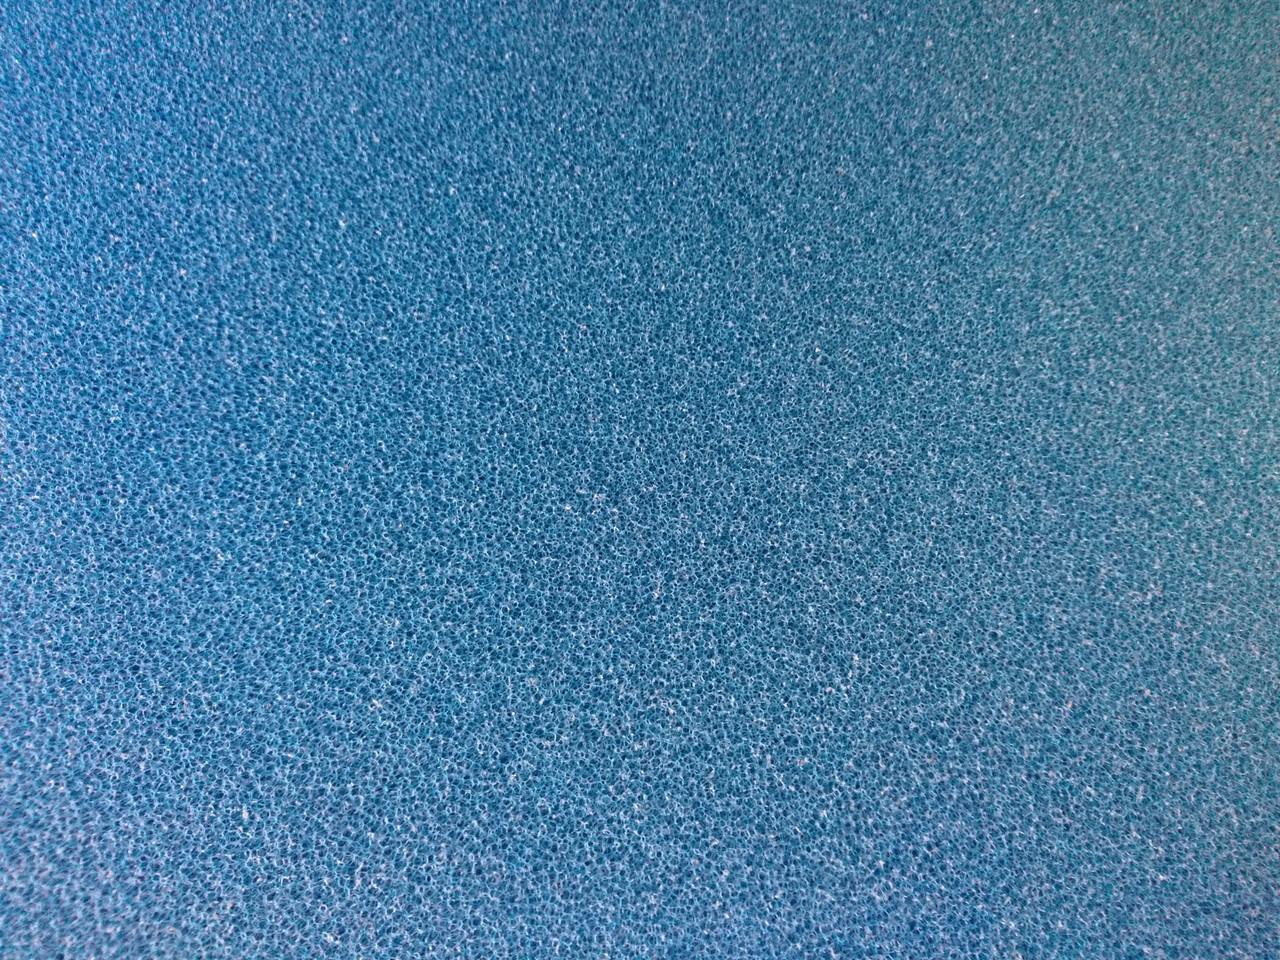 Мочалка синяя, лист (50*50*10)см, среднепористая